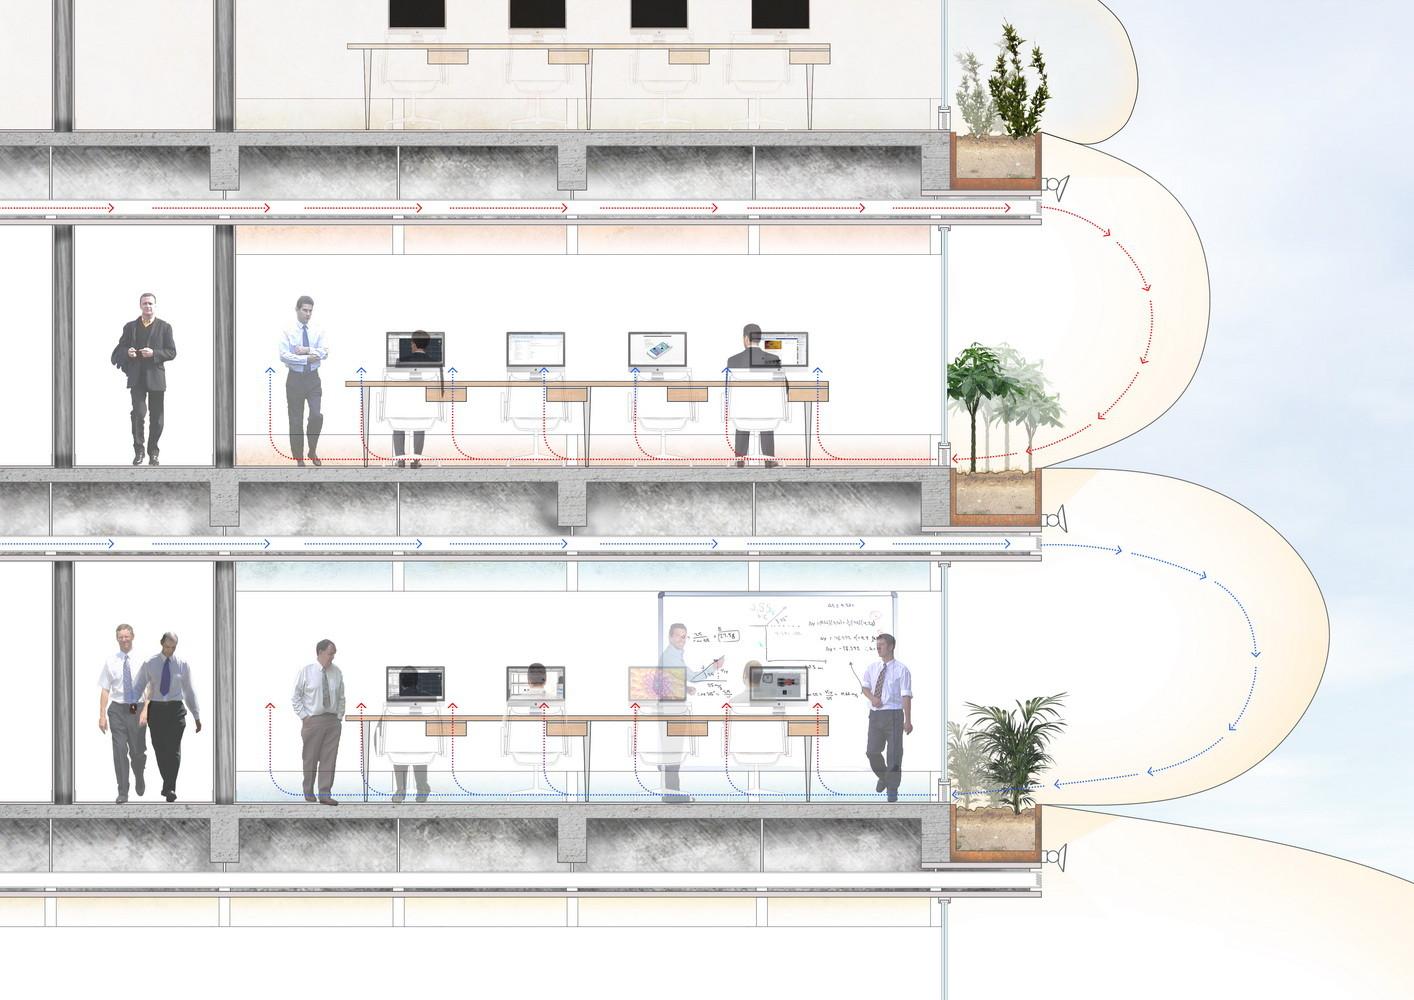 How To Design Floor Plans Gallery Of Bubble Building 3gatti Architecture Studio 8